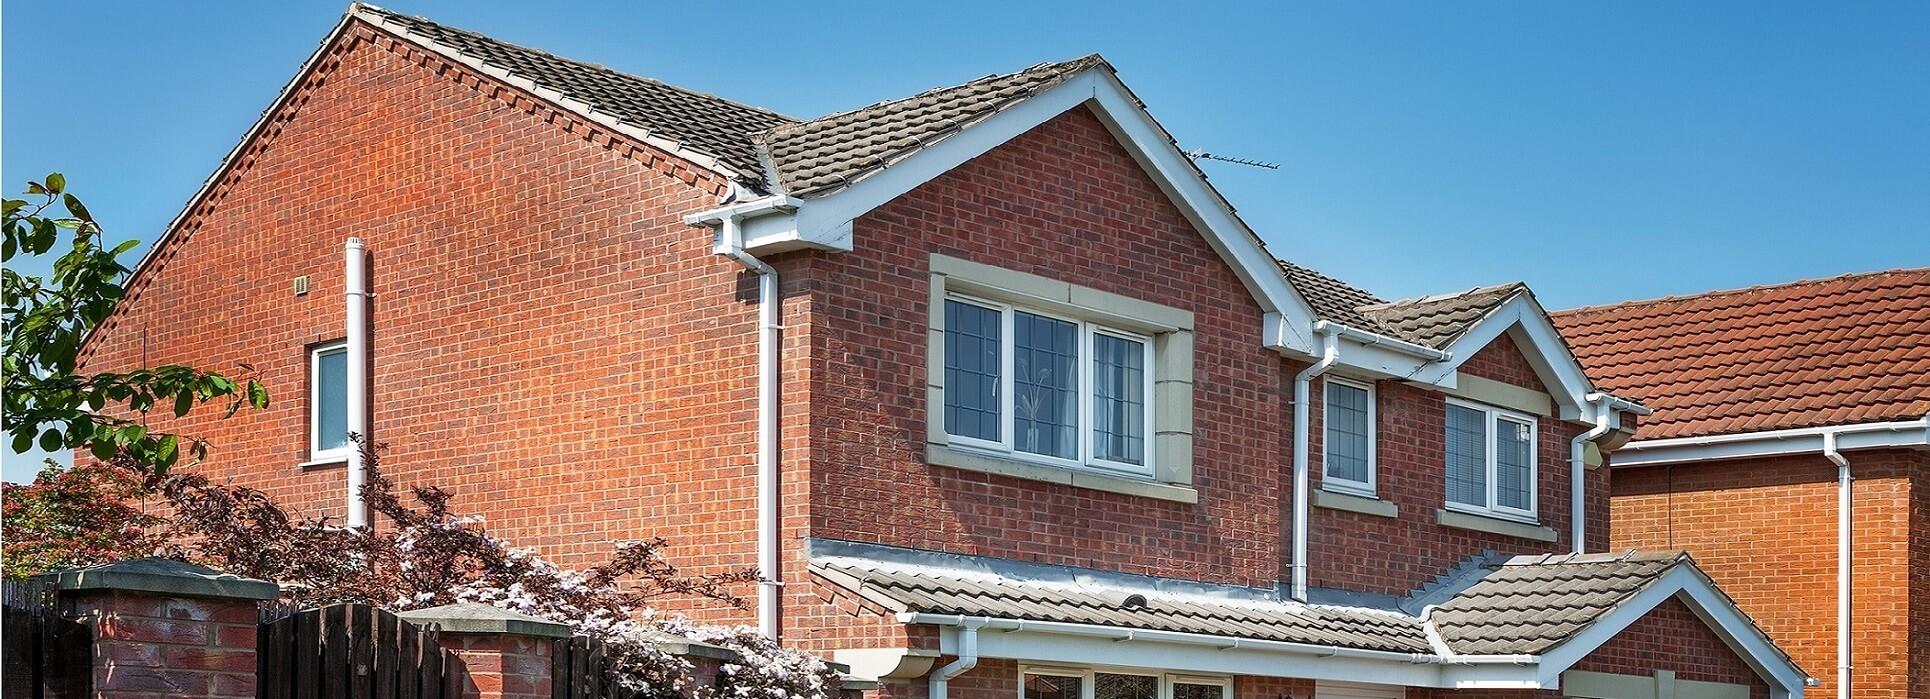 Home Logic Icynene Insulation System Save Home Energy